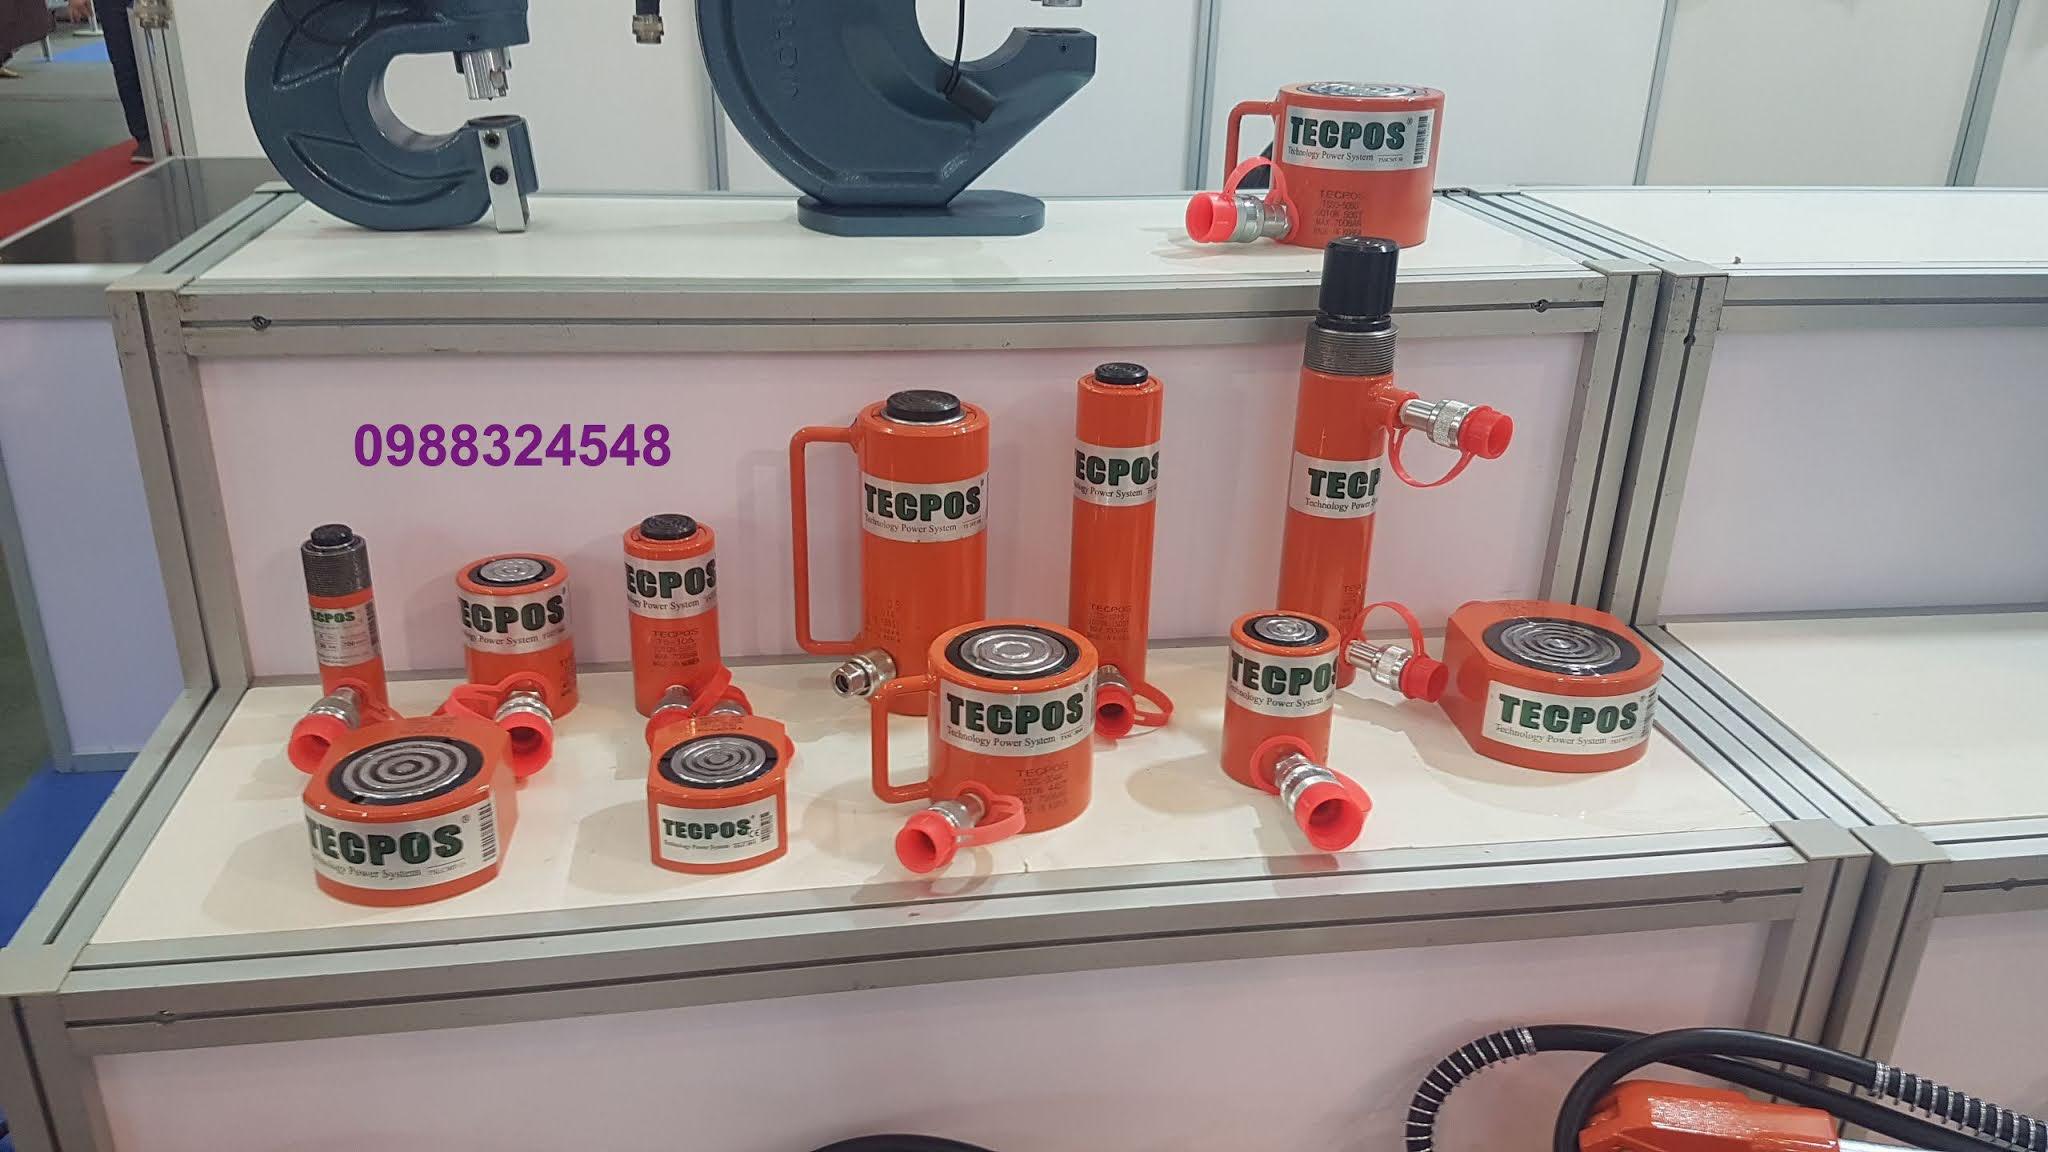 Kích thủy lực Tecpos 10 tấn TS-105